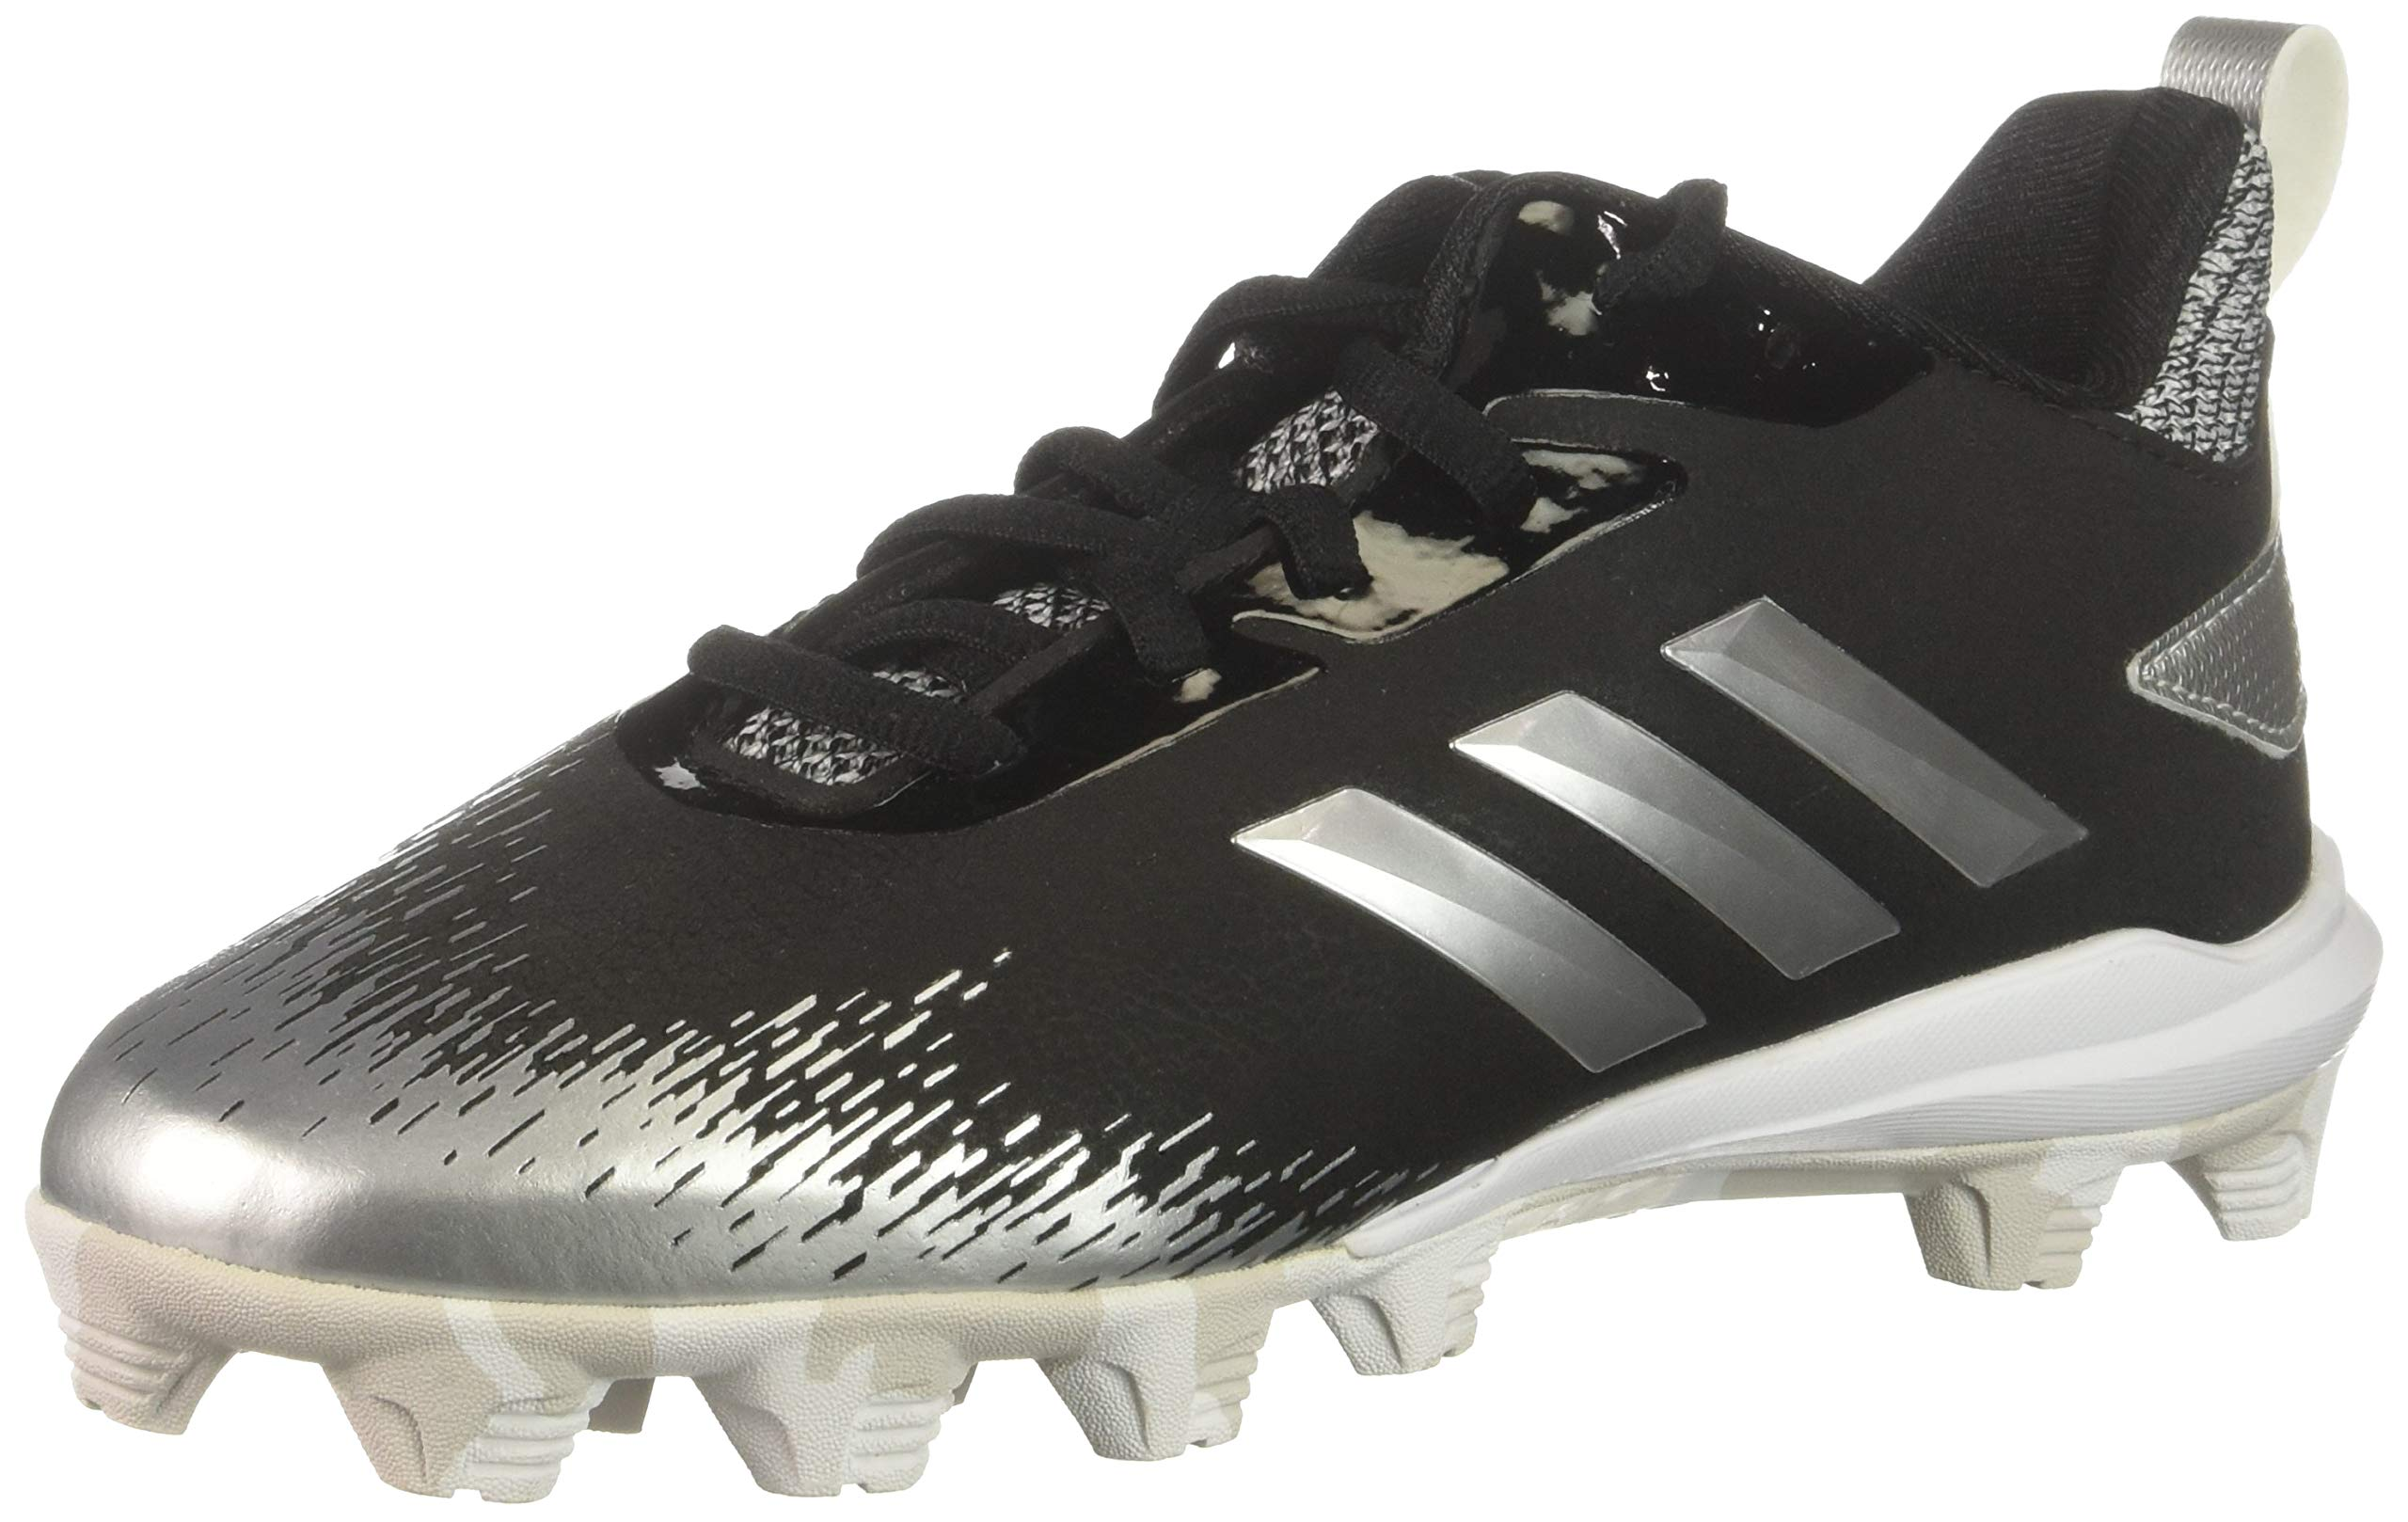 adidas Unisex Adizero Afterburner V Baseball Shoe Black/Silver Metallic/White 1 M US Little Kid